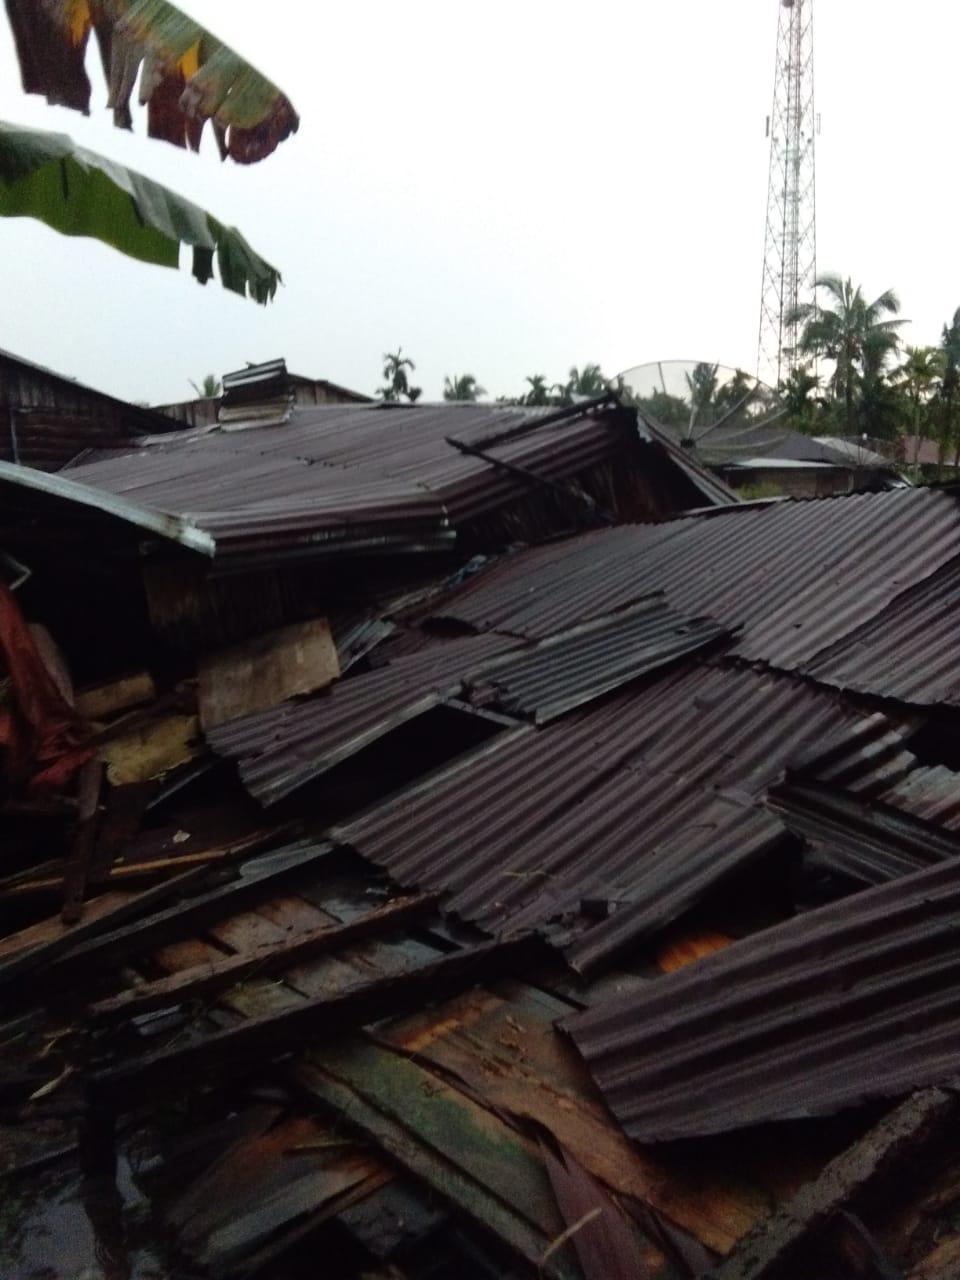 20 Rumah Warga Desa Sanglar Rusak Dihantam Angin Puting Beliung,  Seorang Balita Meninggal Dunia